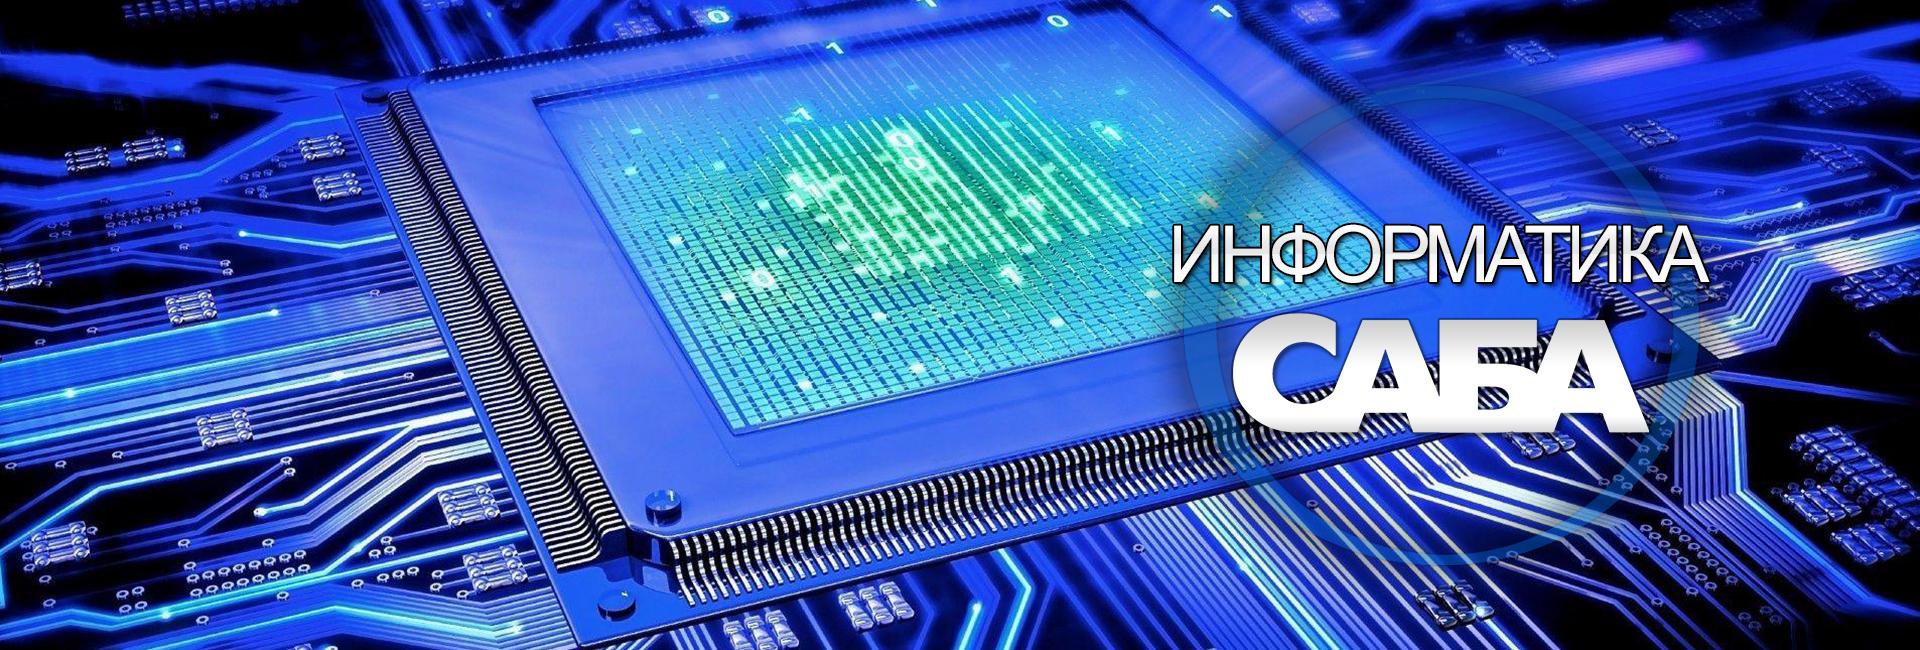 Најсовремени IT технологии